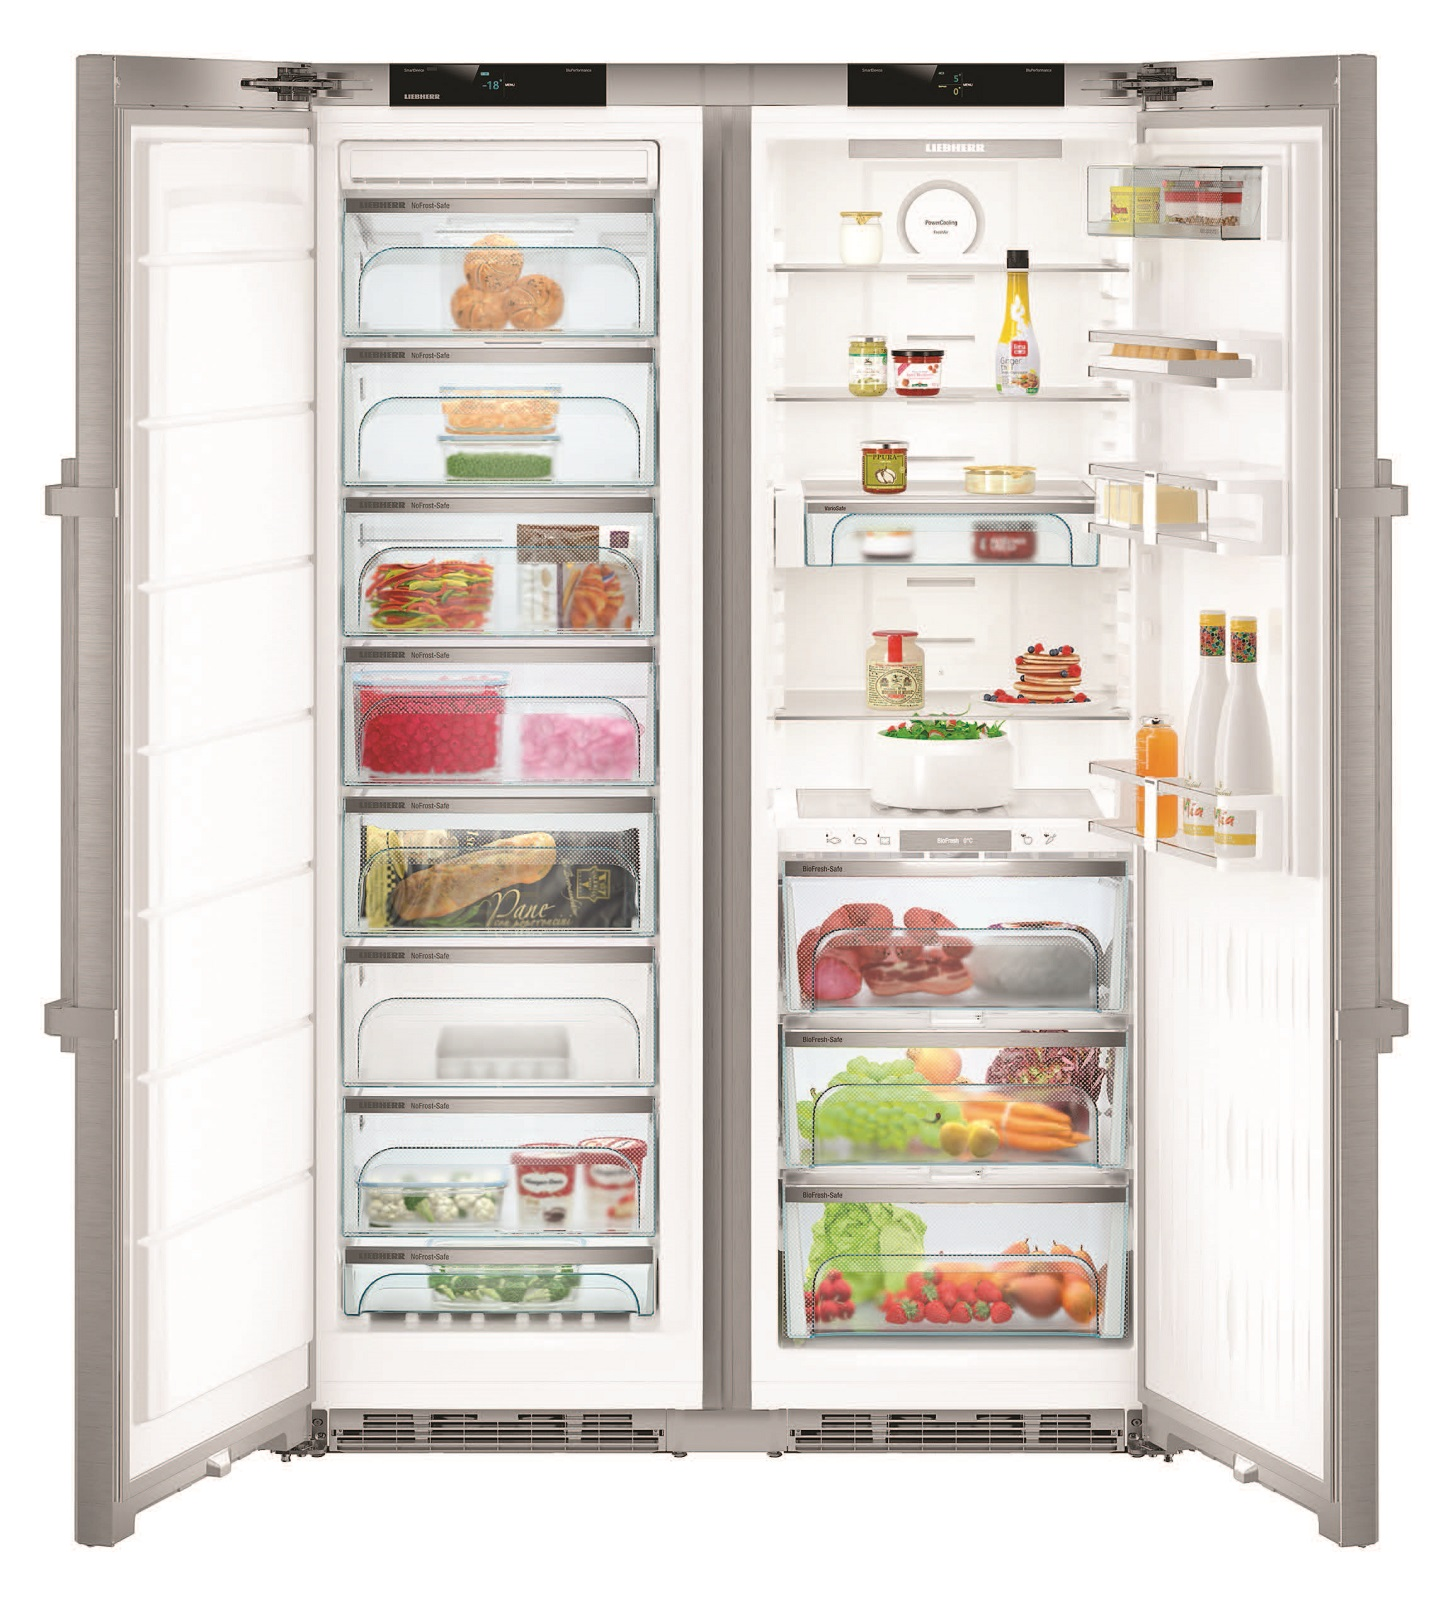 Side-by-Side холодильник Liebherr SBSes 8773 купить украина